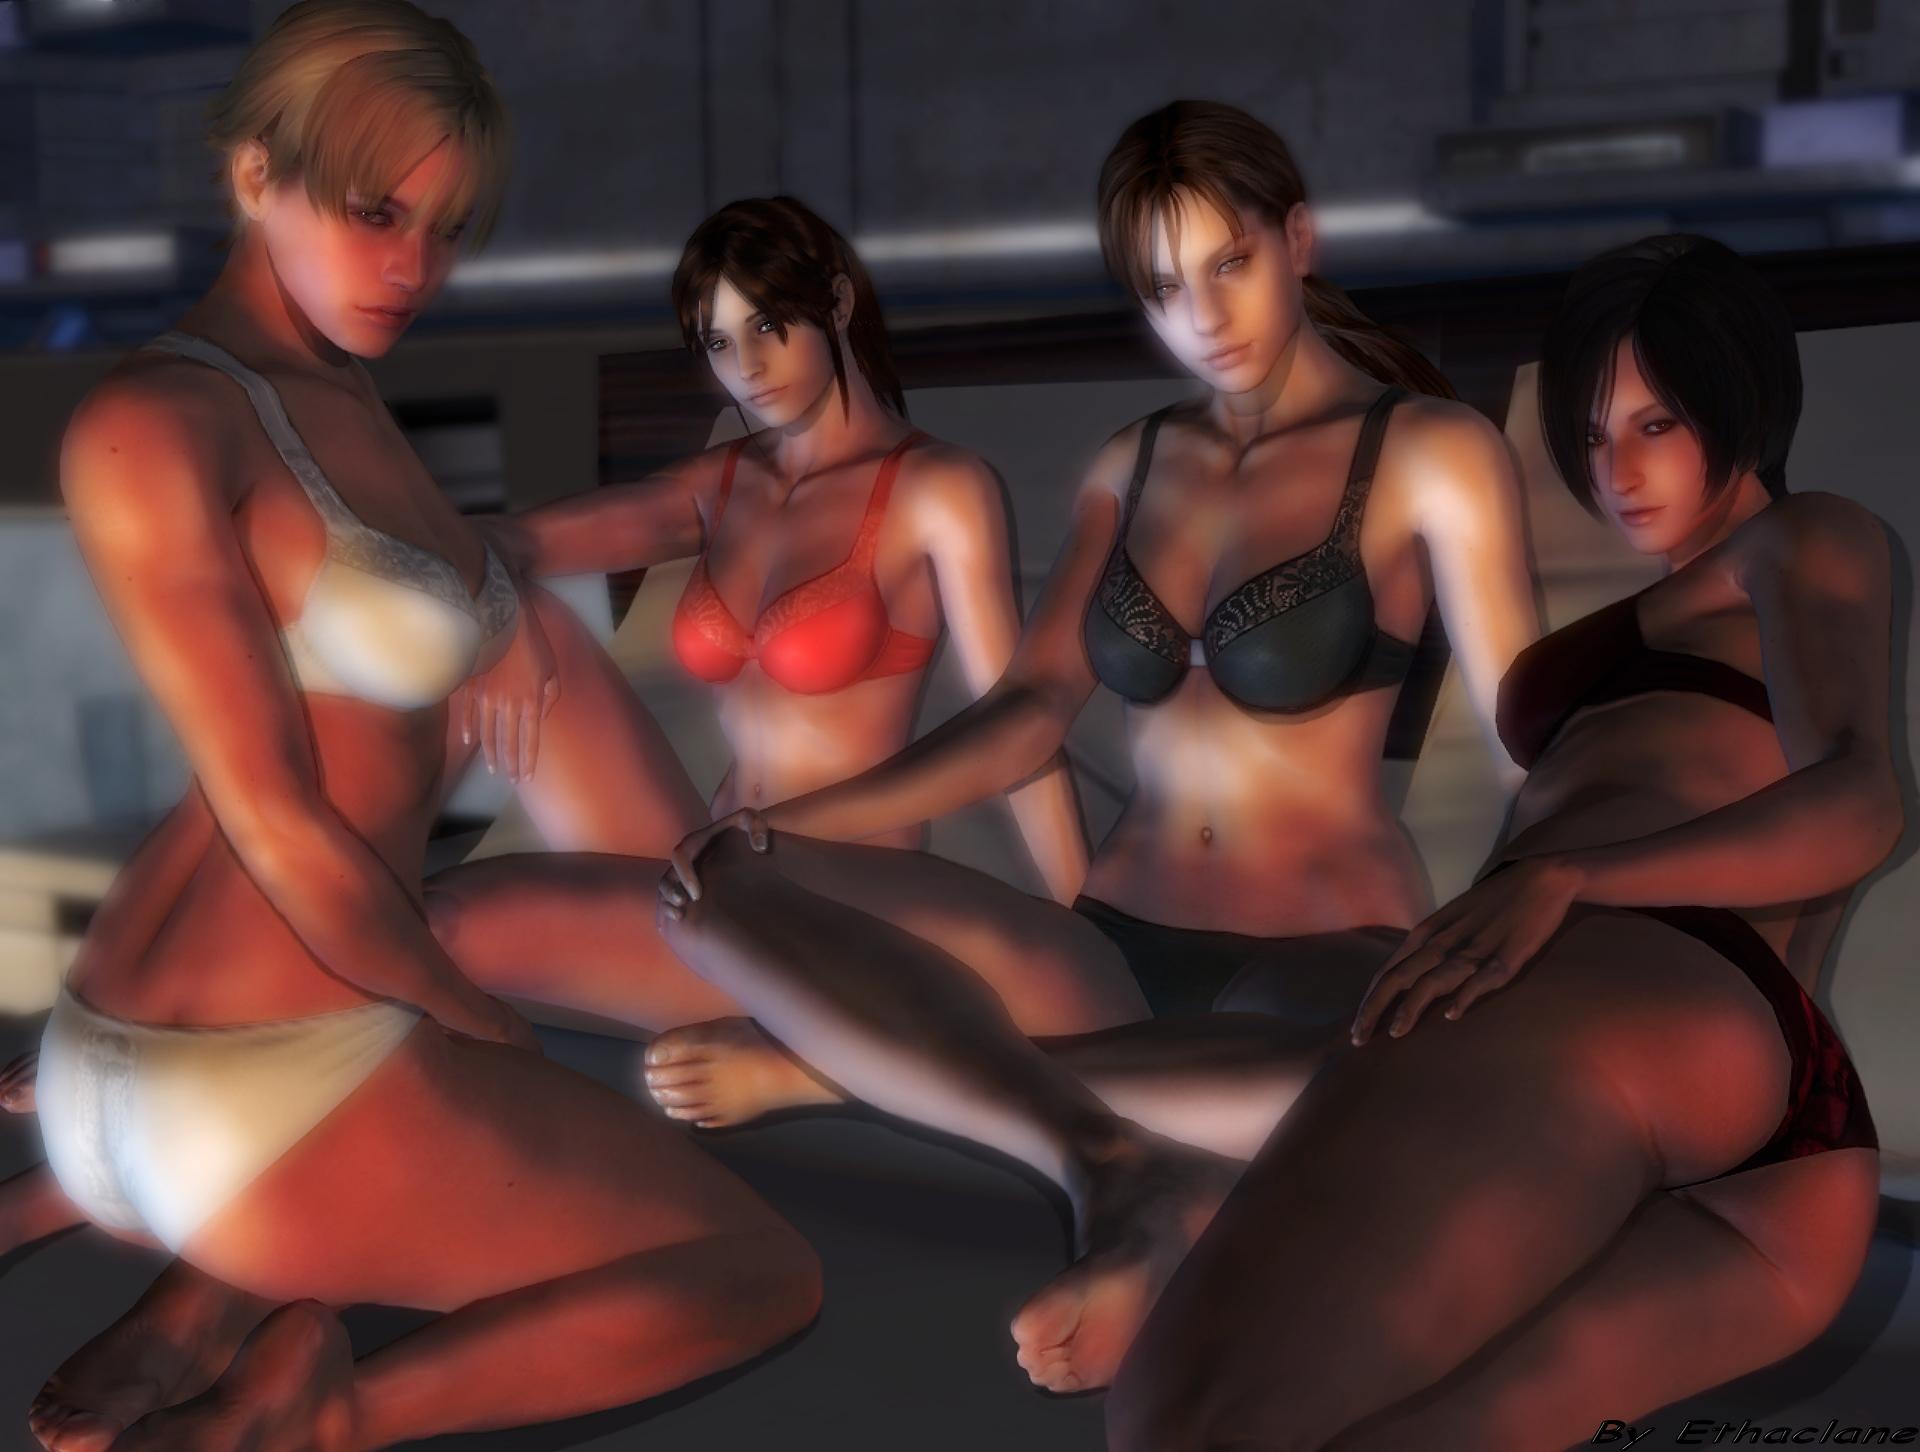 Hot nude sex videos o raccoon city sex video